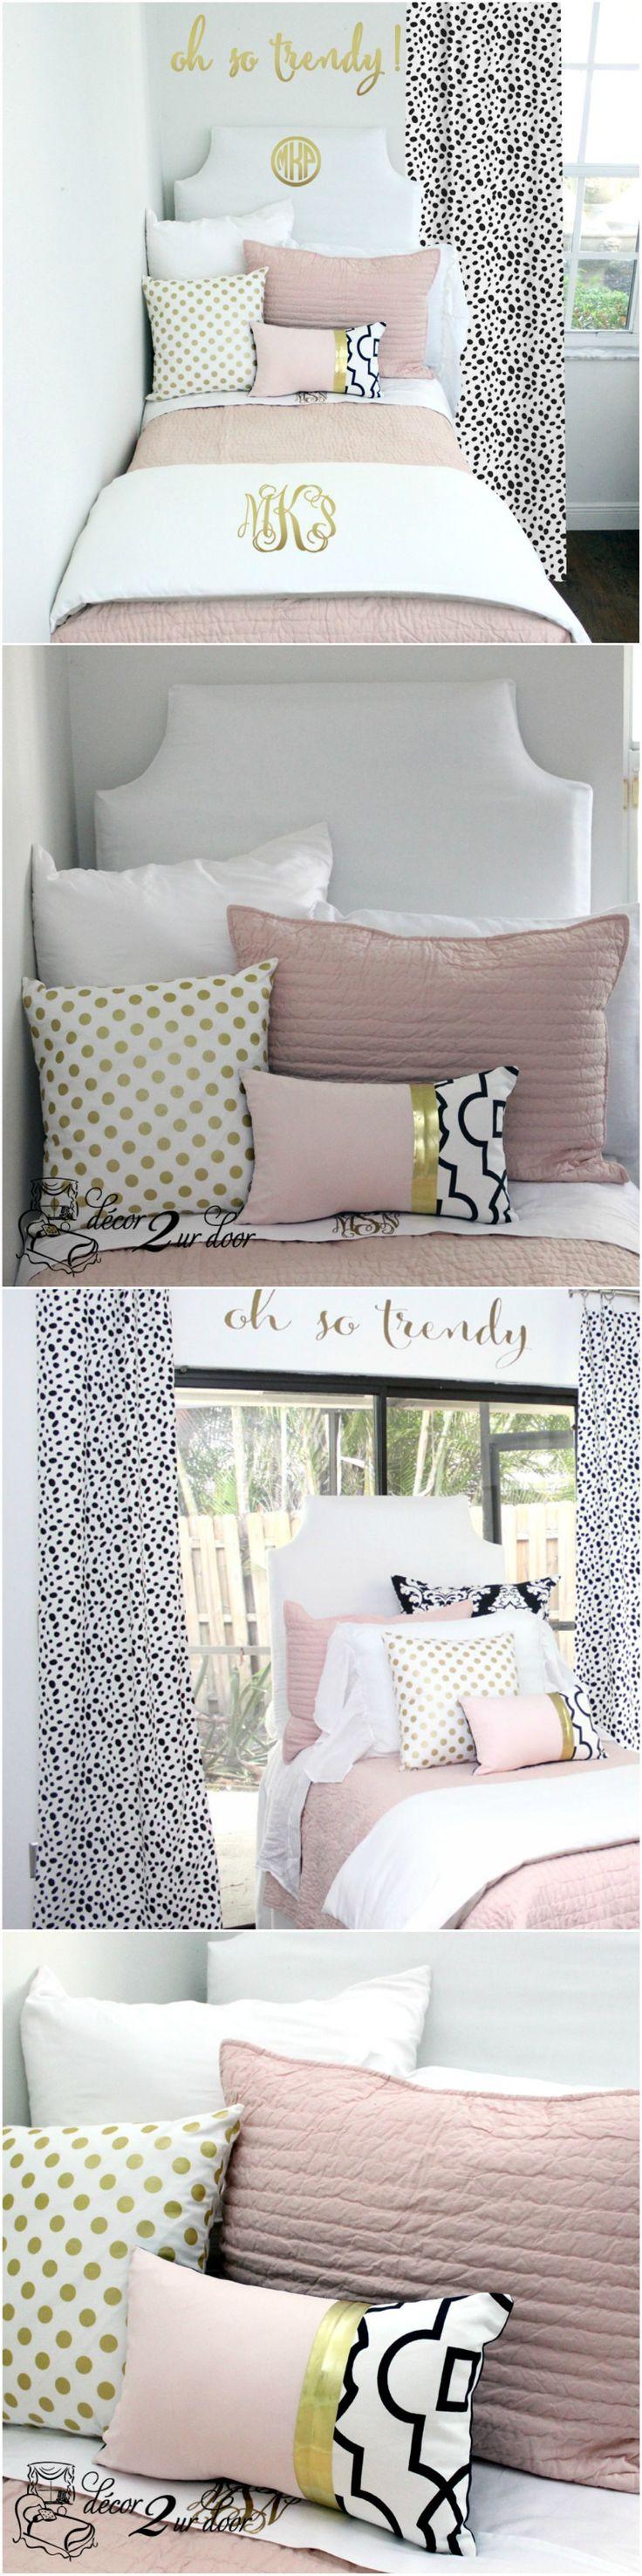 Dorm Room Bulletin Board Ideas   Blush Pink White A Pop Of Black Designer  Dorm Bedding. Download Good Ideas